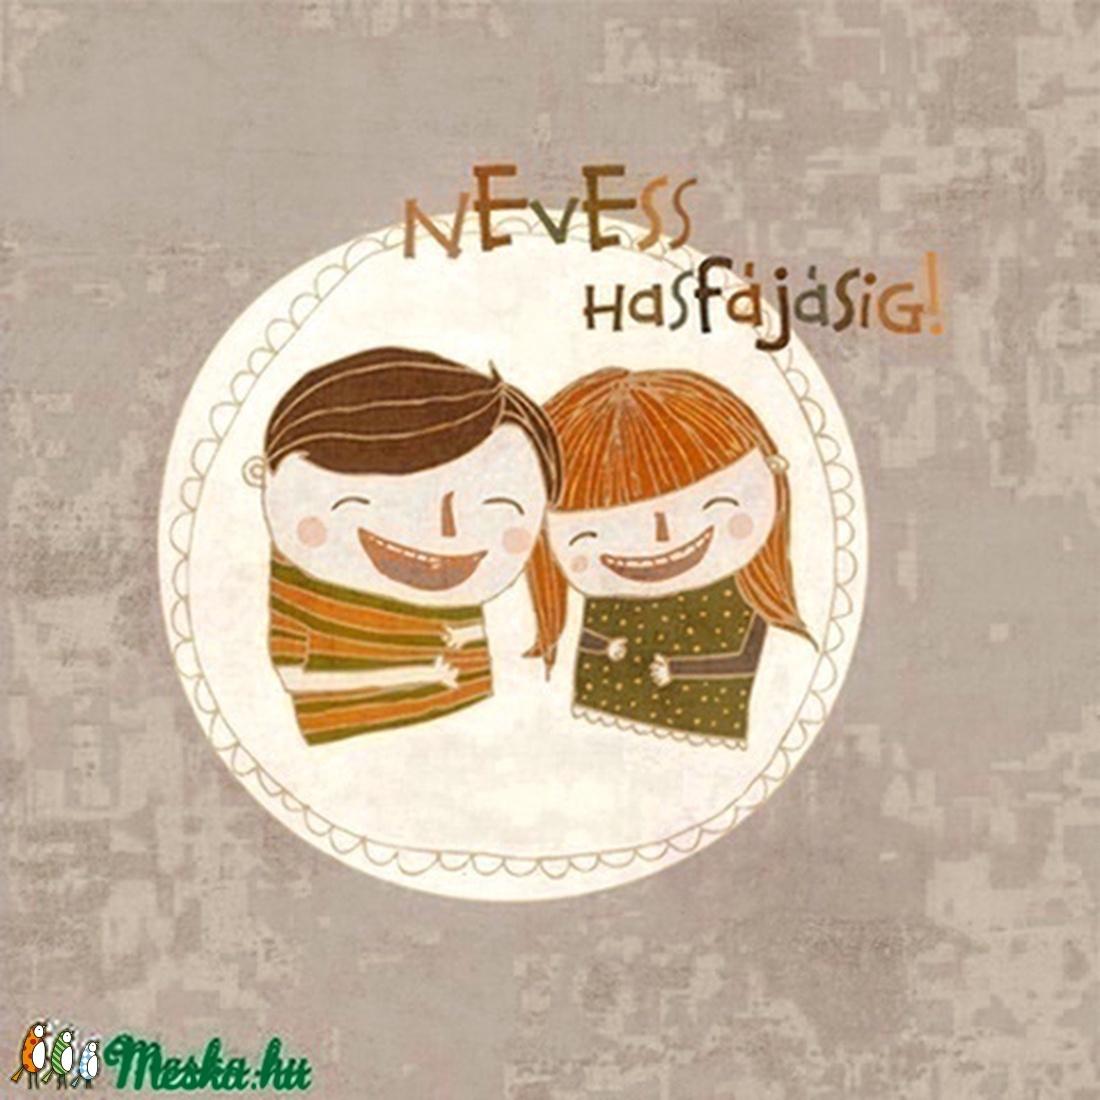 Pozitív pszichológia sorozat - Nevess hasfájásig! kép (schalleszter) - Meska.hu